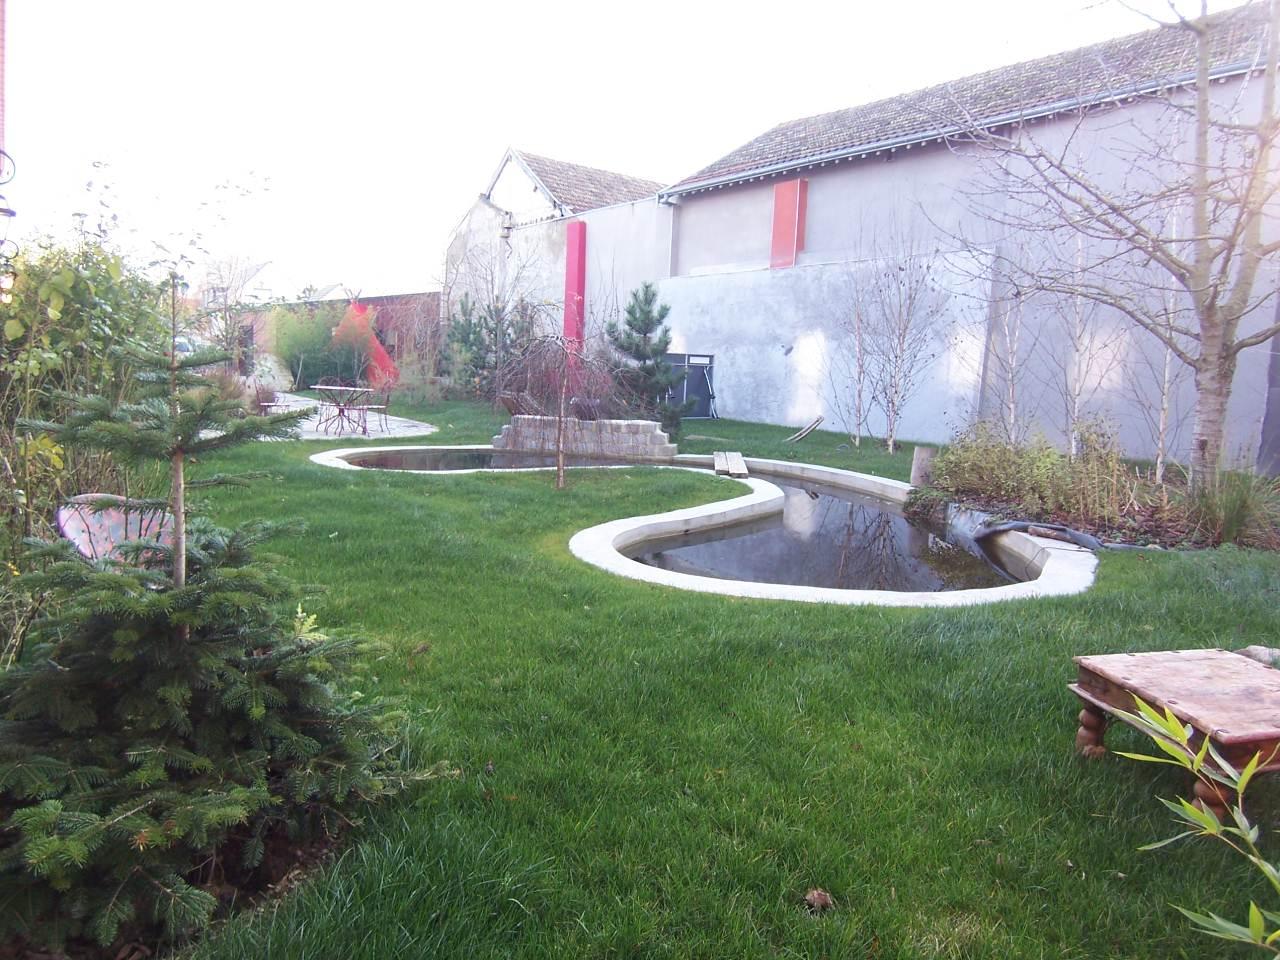 Maison proche reims agence des sacres for Agence paysage reims